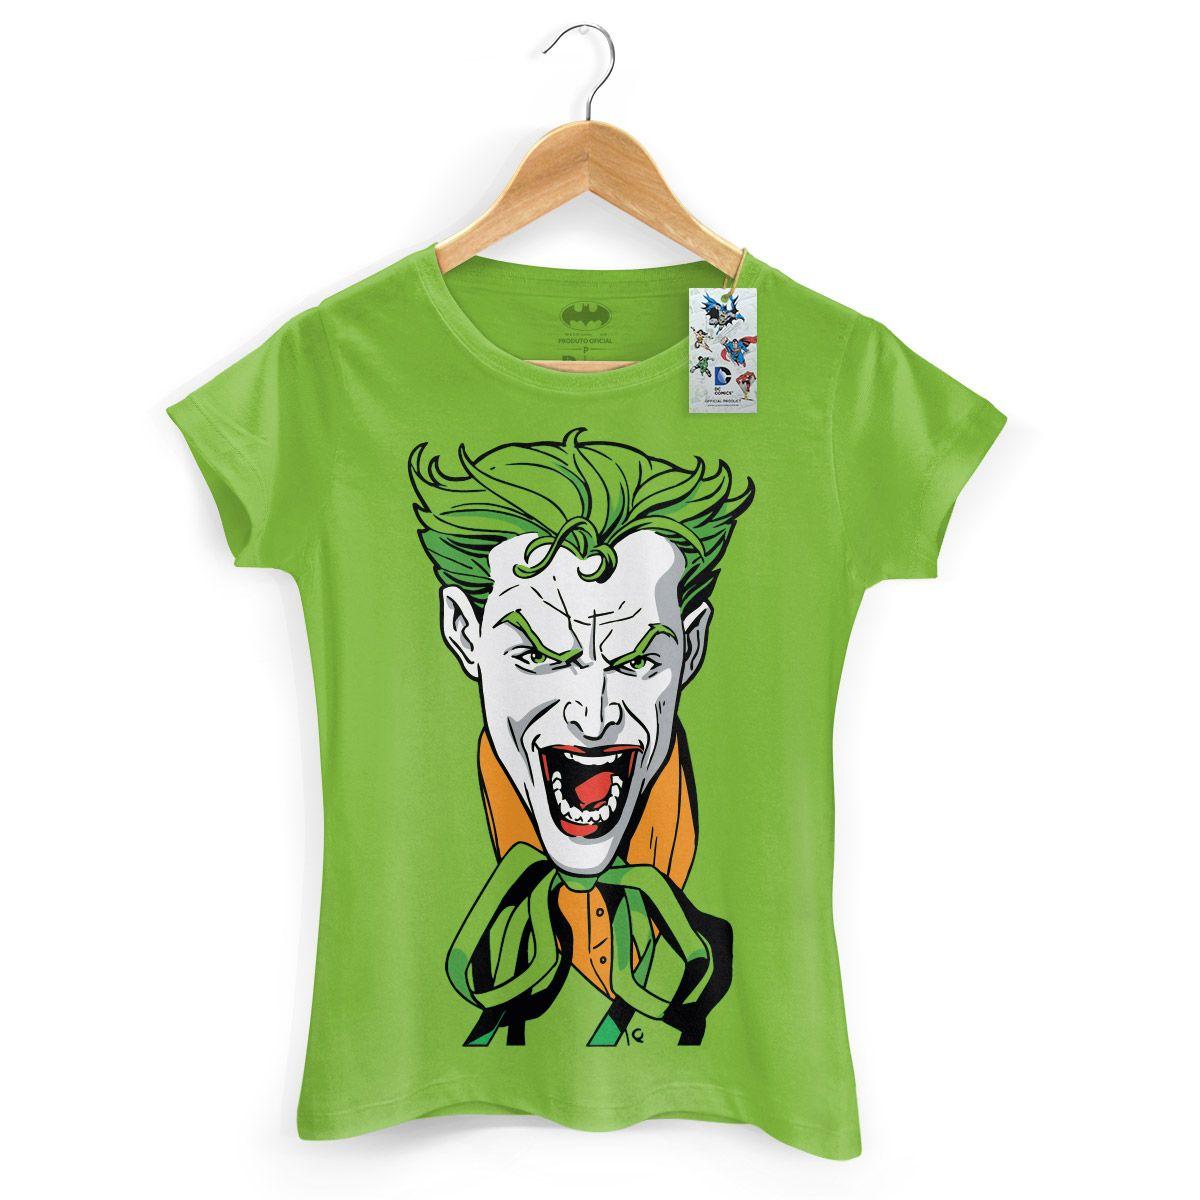 Loja Oficial DC Comics Camiseta Feminina The Joker #LojaDCComics #TheJoker #bandUPSTore